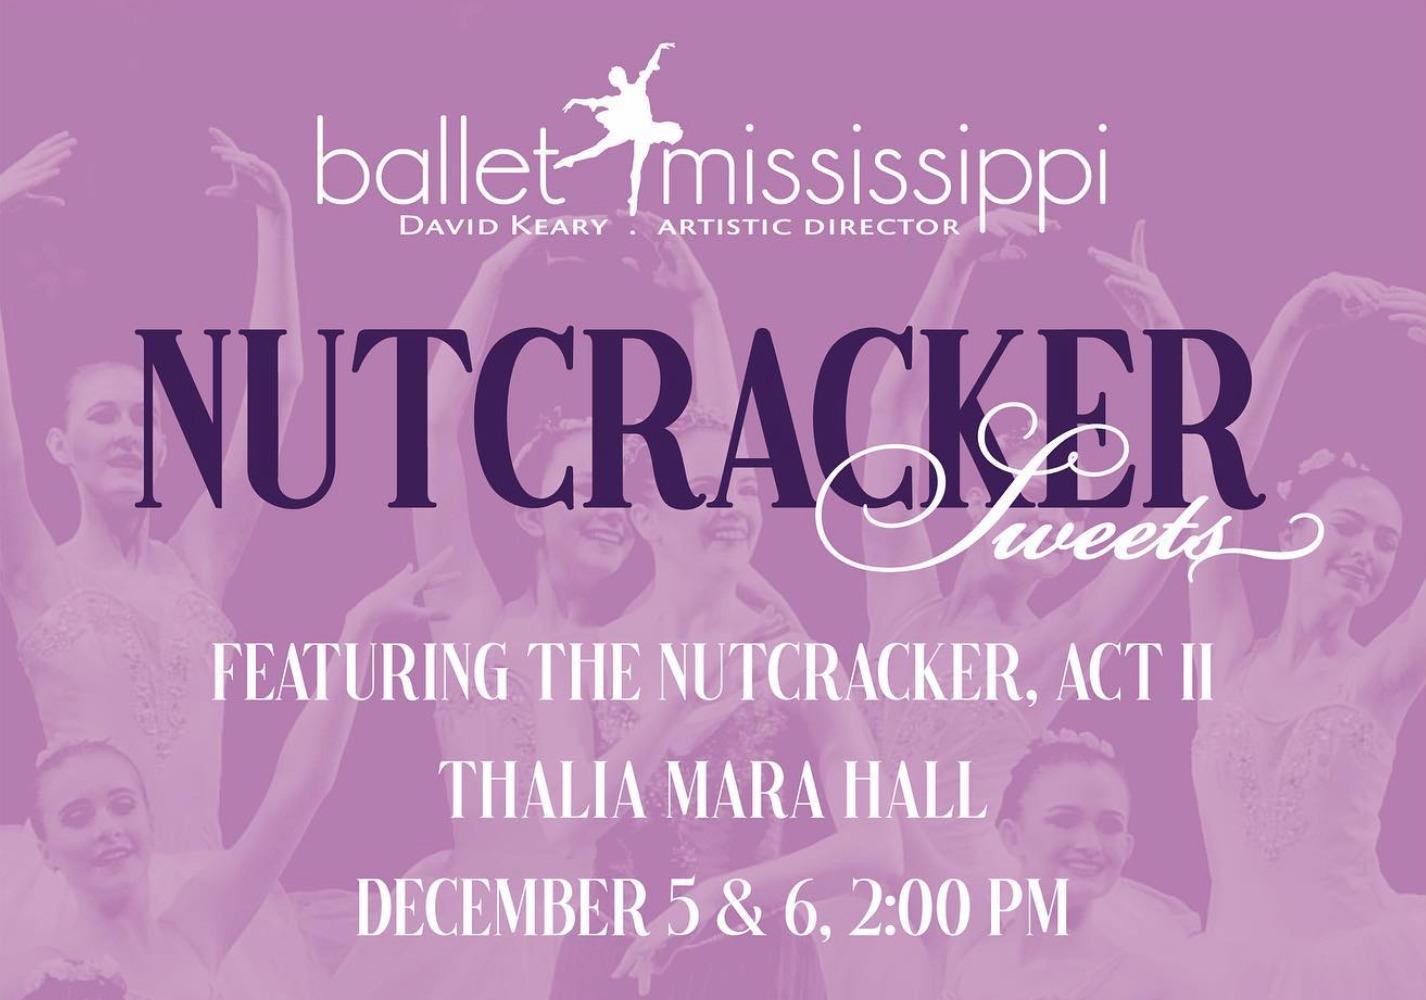 Ballet Mississippi: Nutcracker Sweets